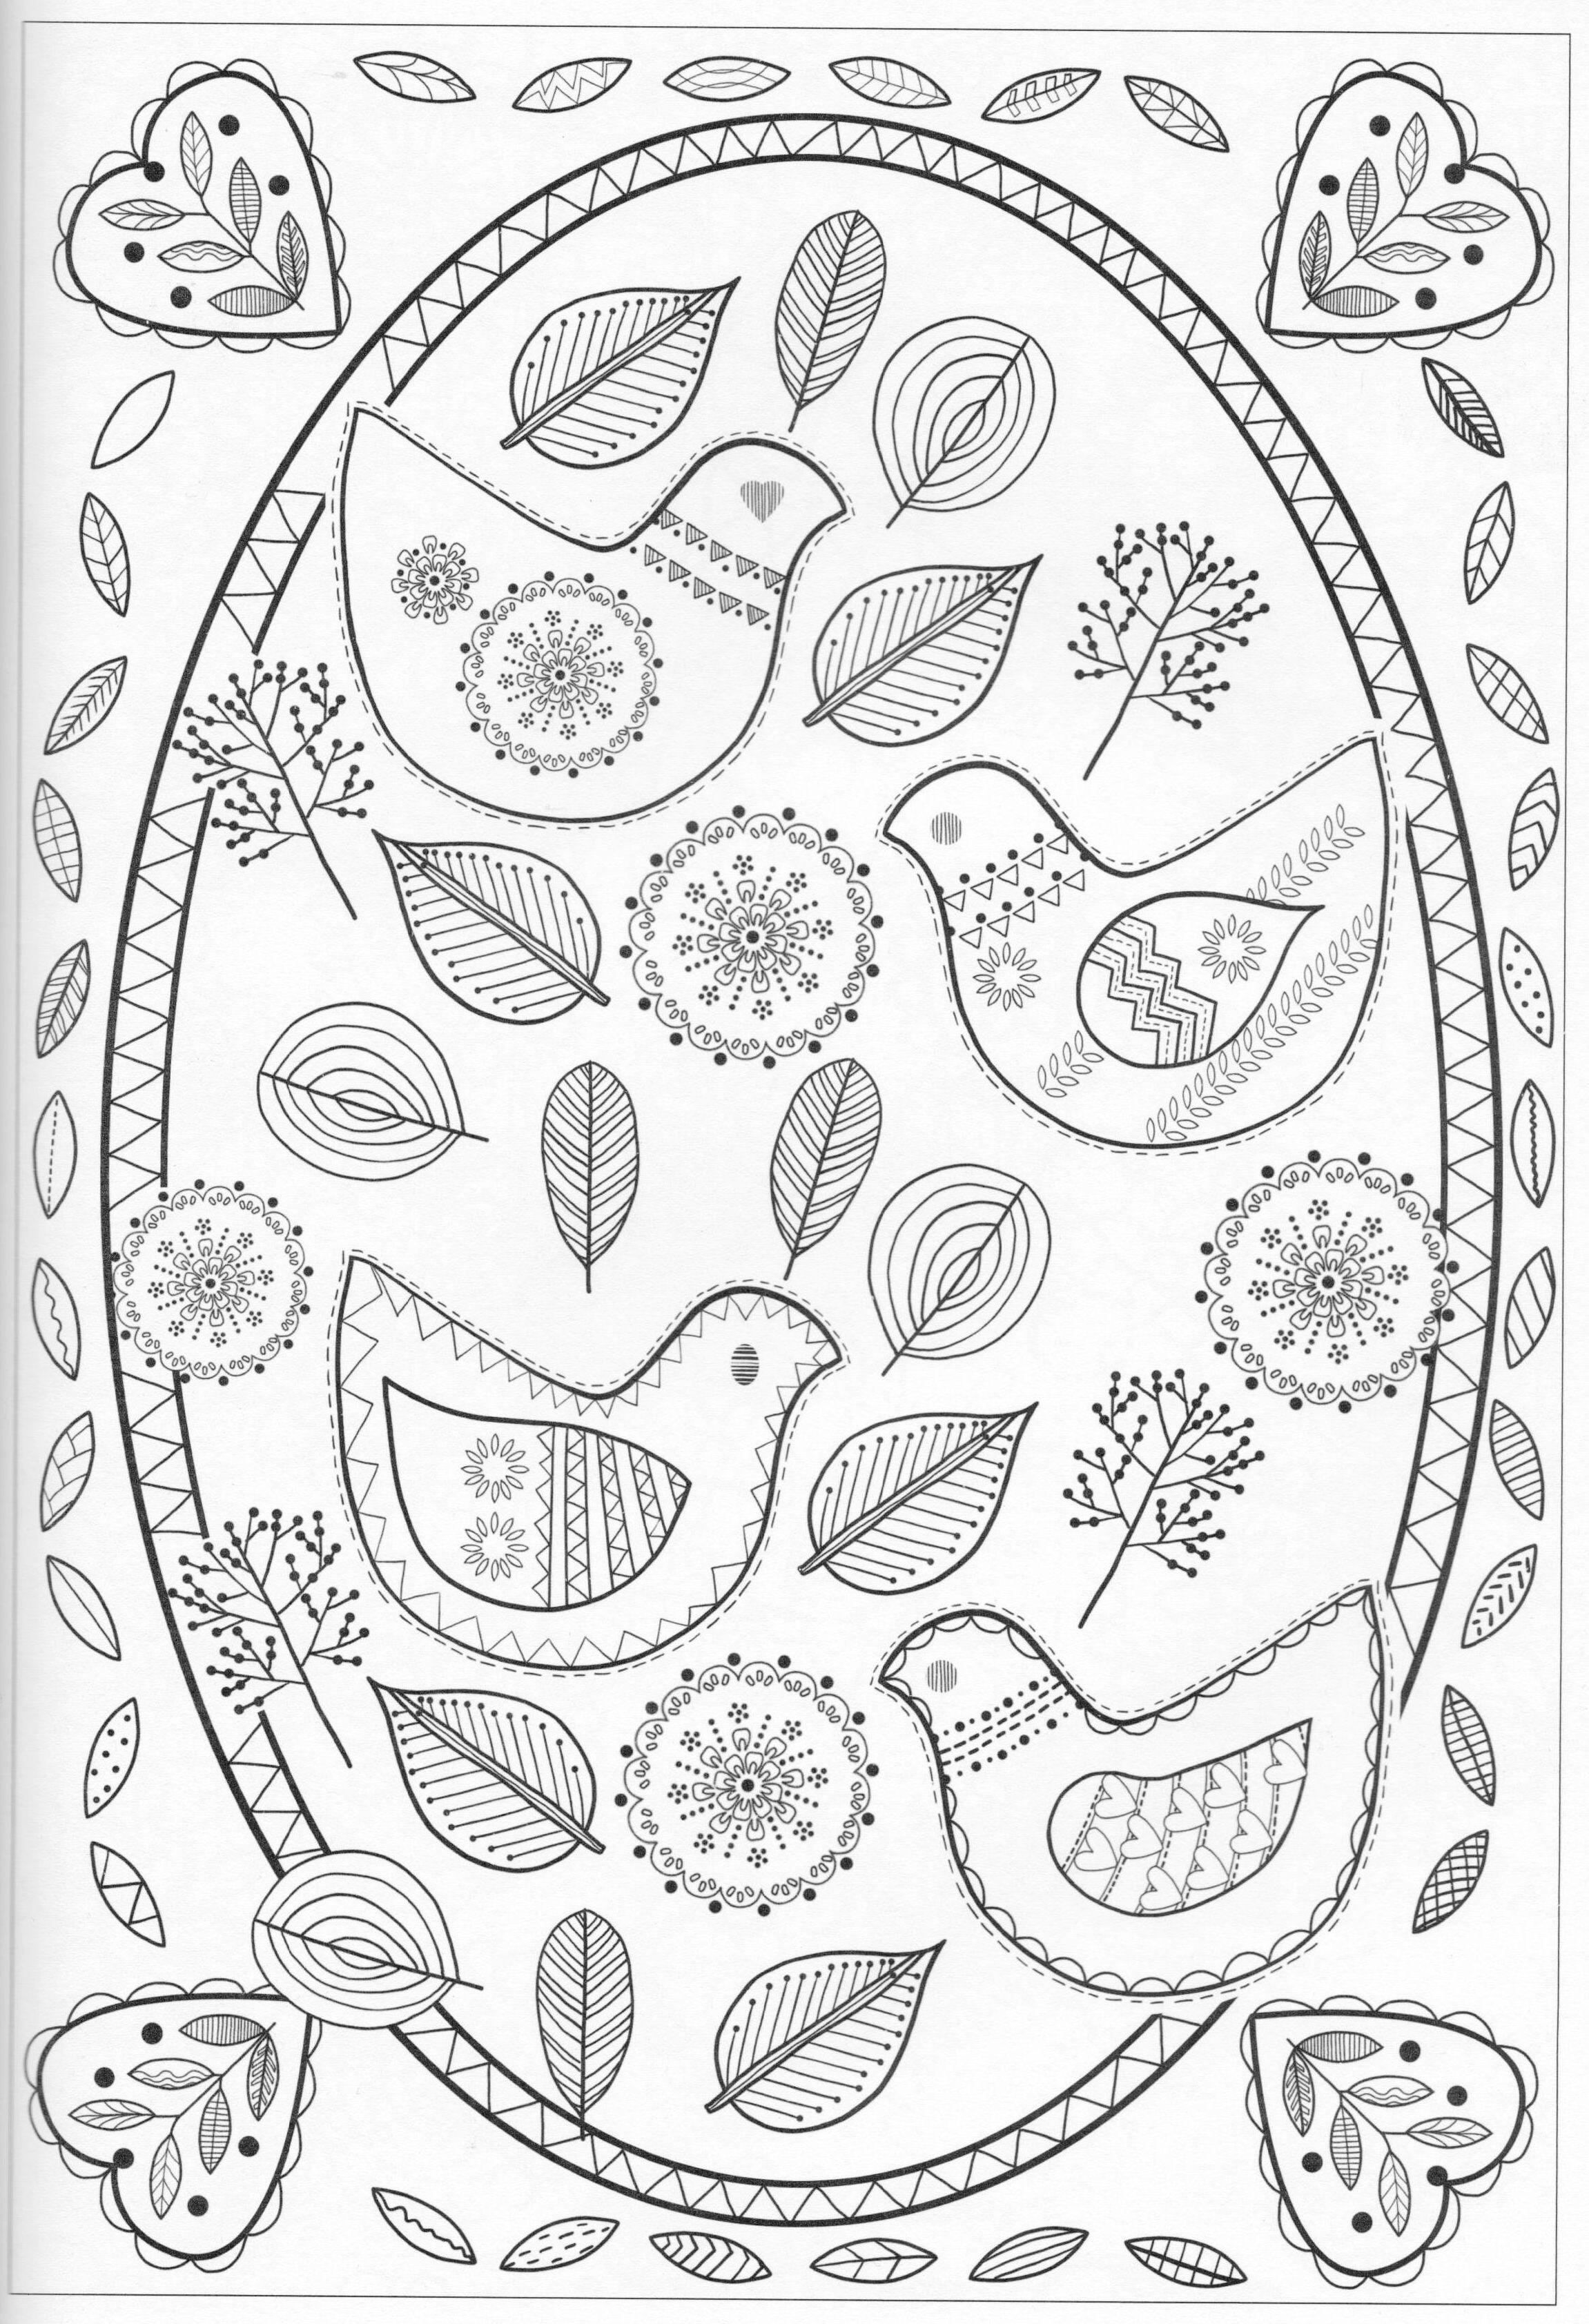 Biene Maja Ausmalbild Frisch Mandala Ostern Malvorlagen Schön 149 Dibujos Para Imprimir Colorear Bild